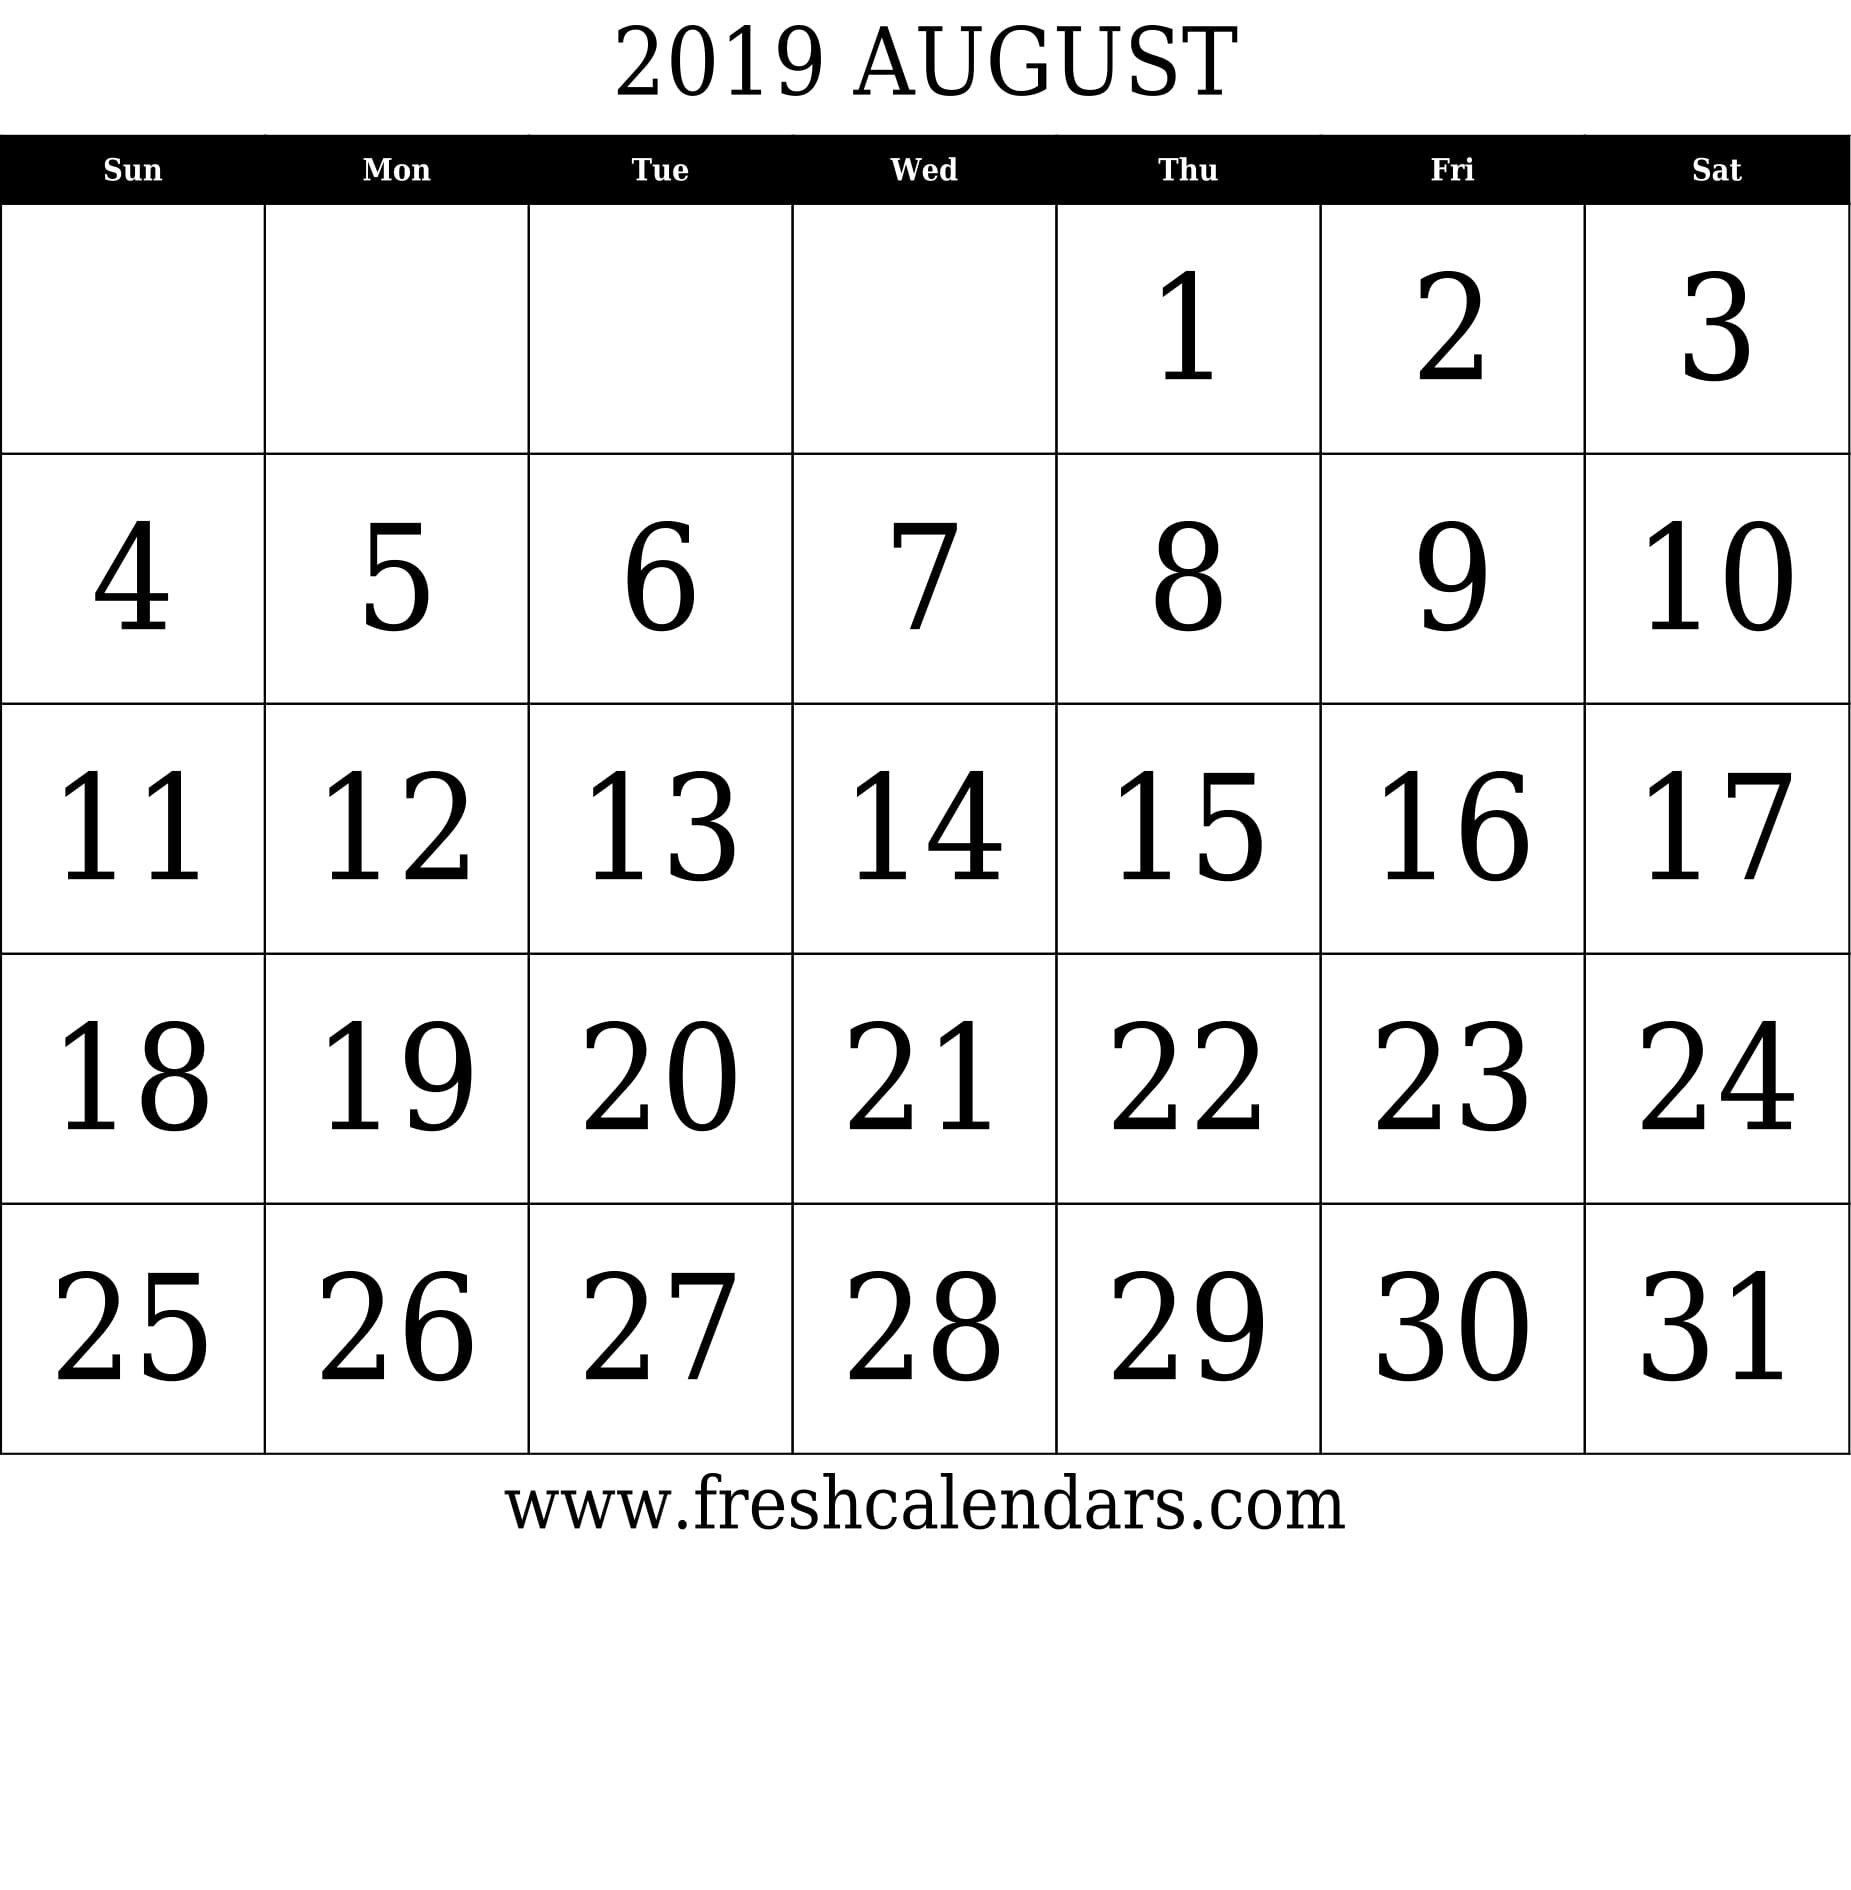 August 2019 Calendar Printable - Fresh Calendars August 3 2019 Calendar